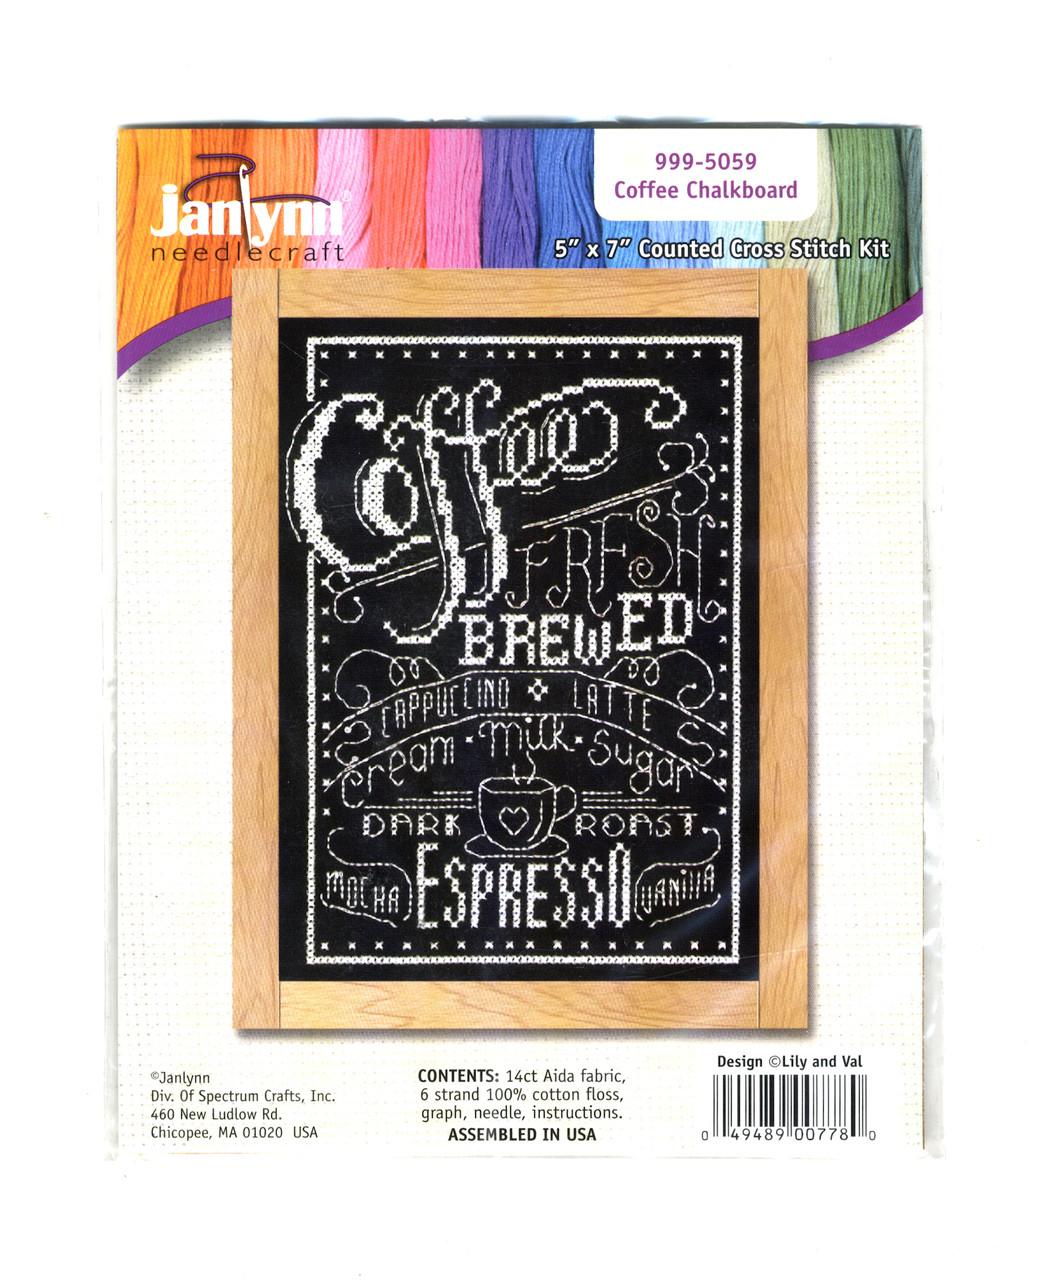 Janlynn - Coffee Chalkboard